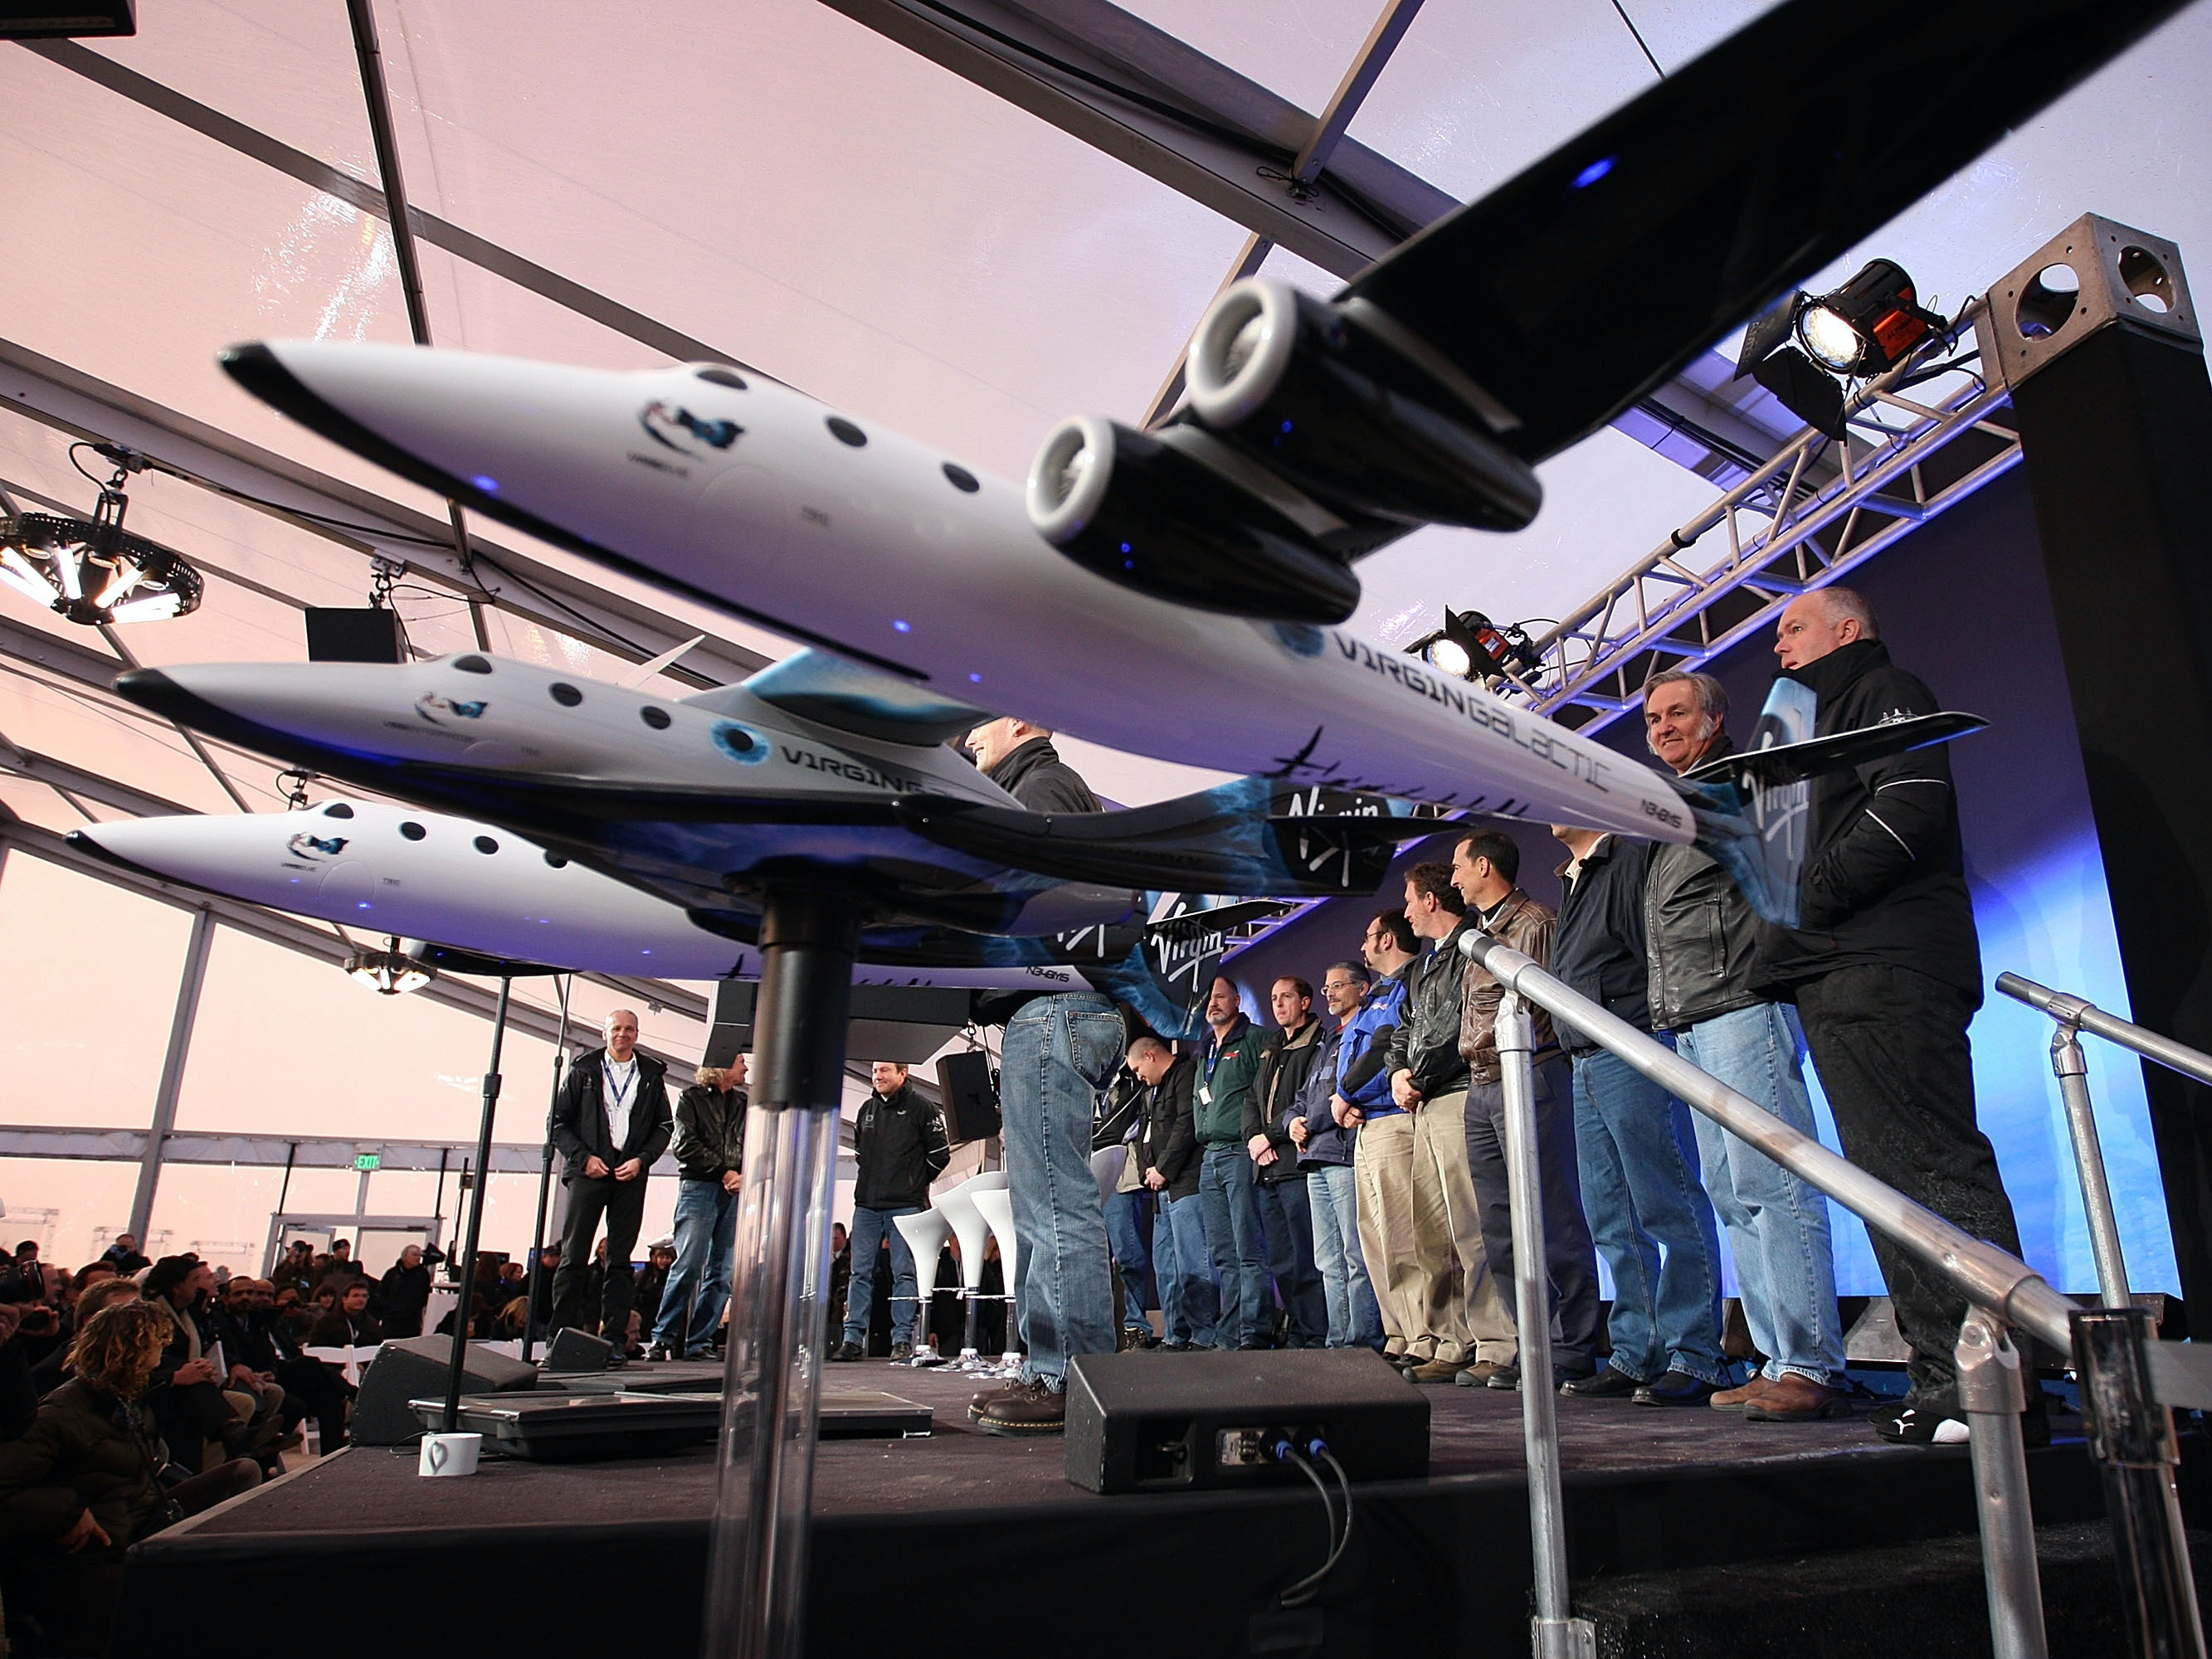 Virgin Galactic to Resume Crewed SpaceShipTwo Tests